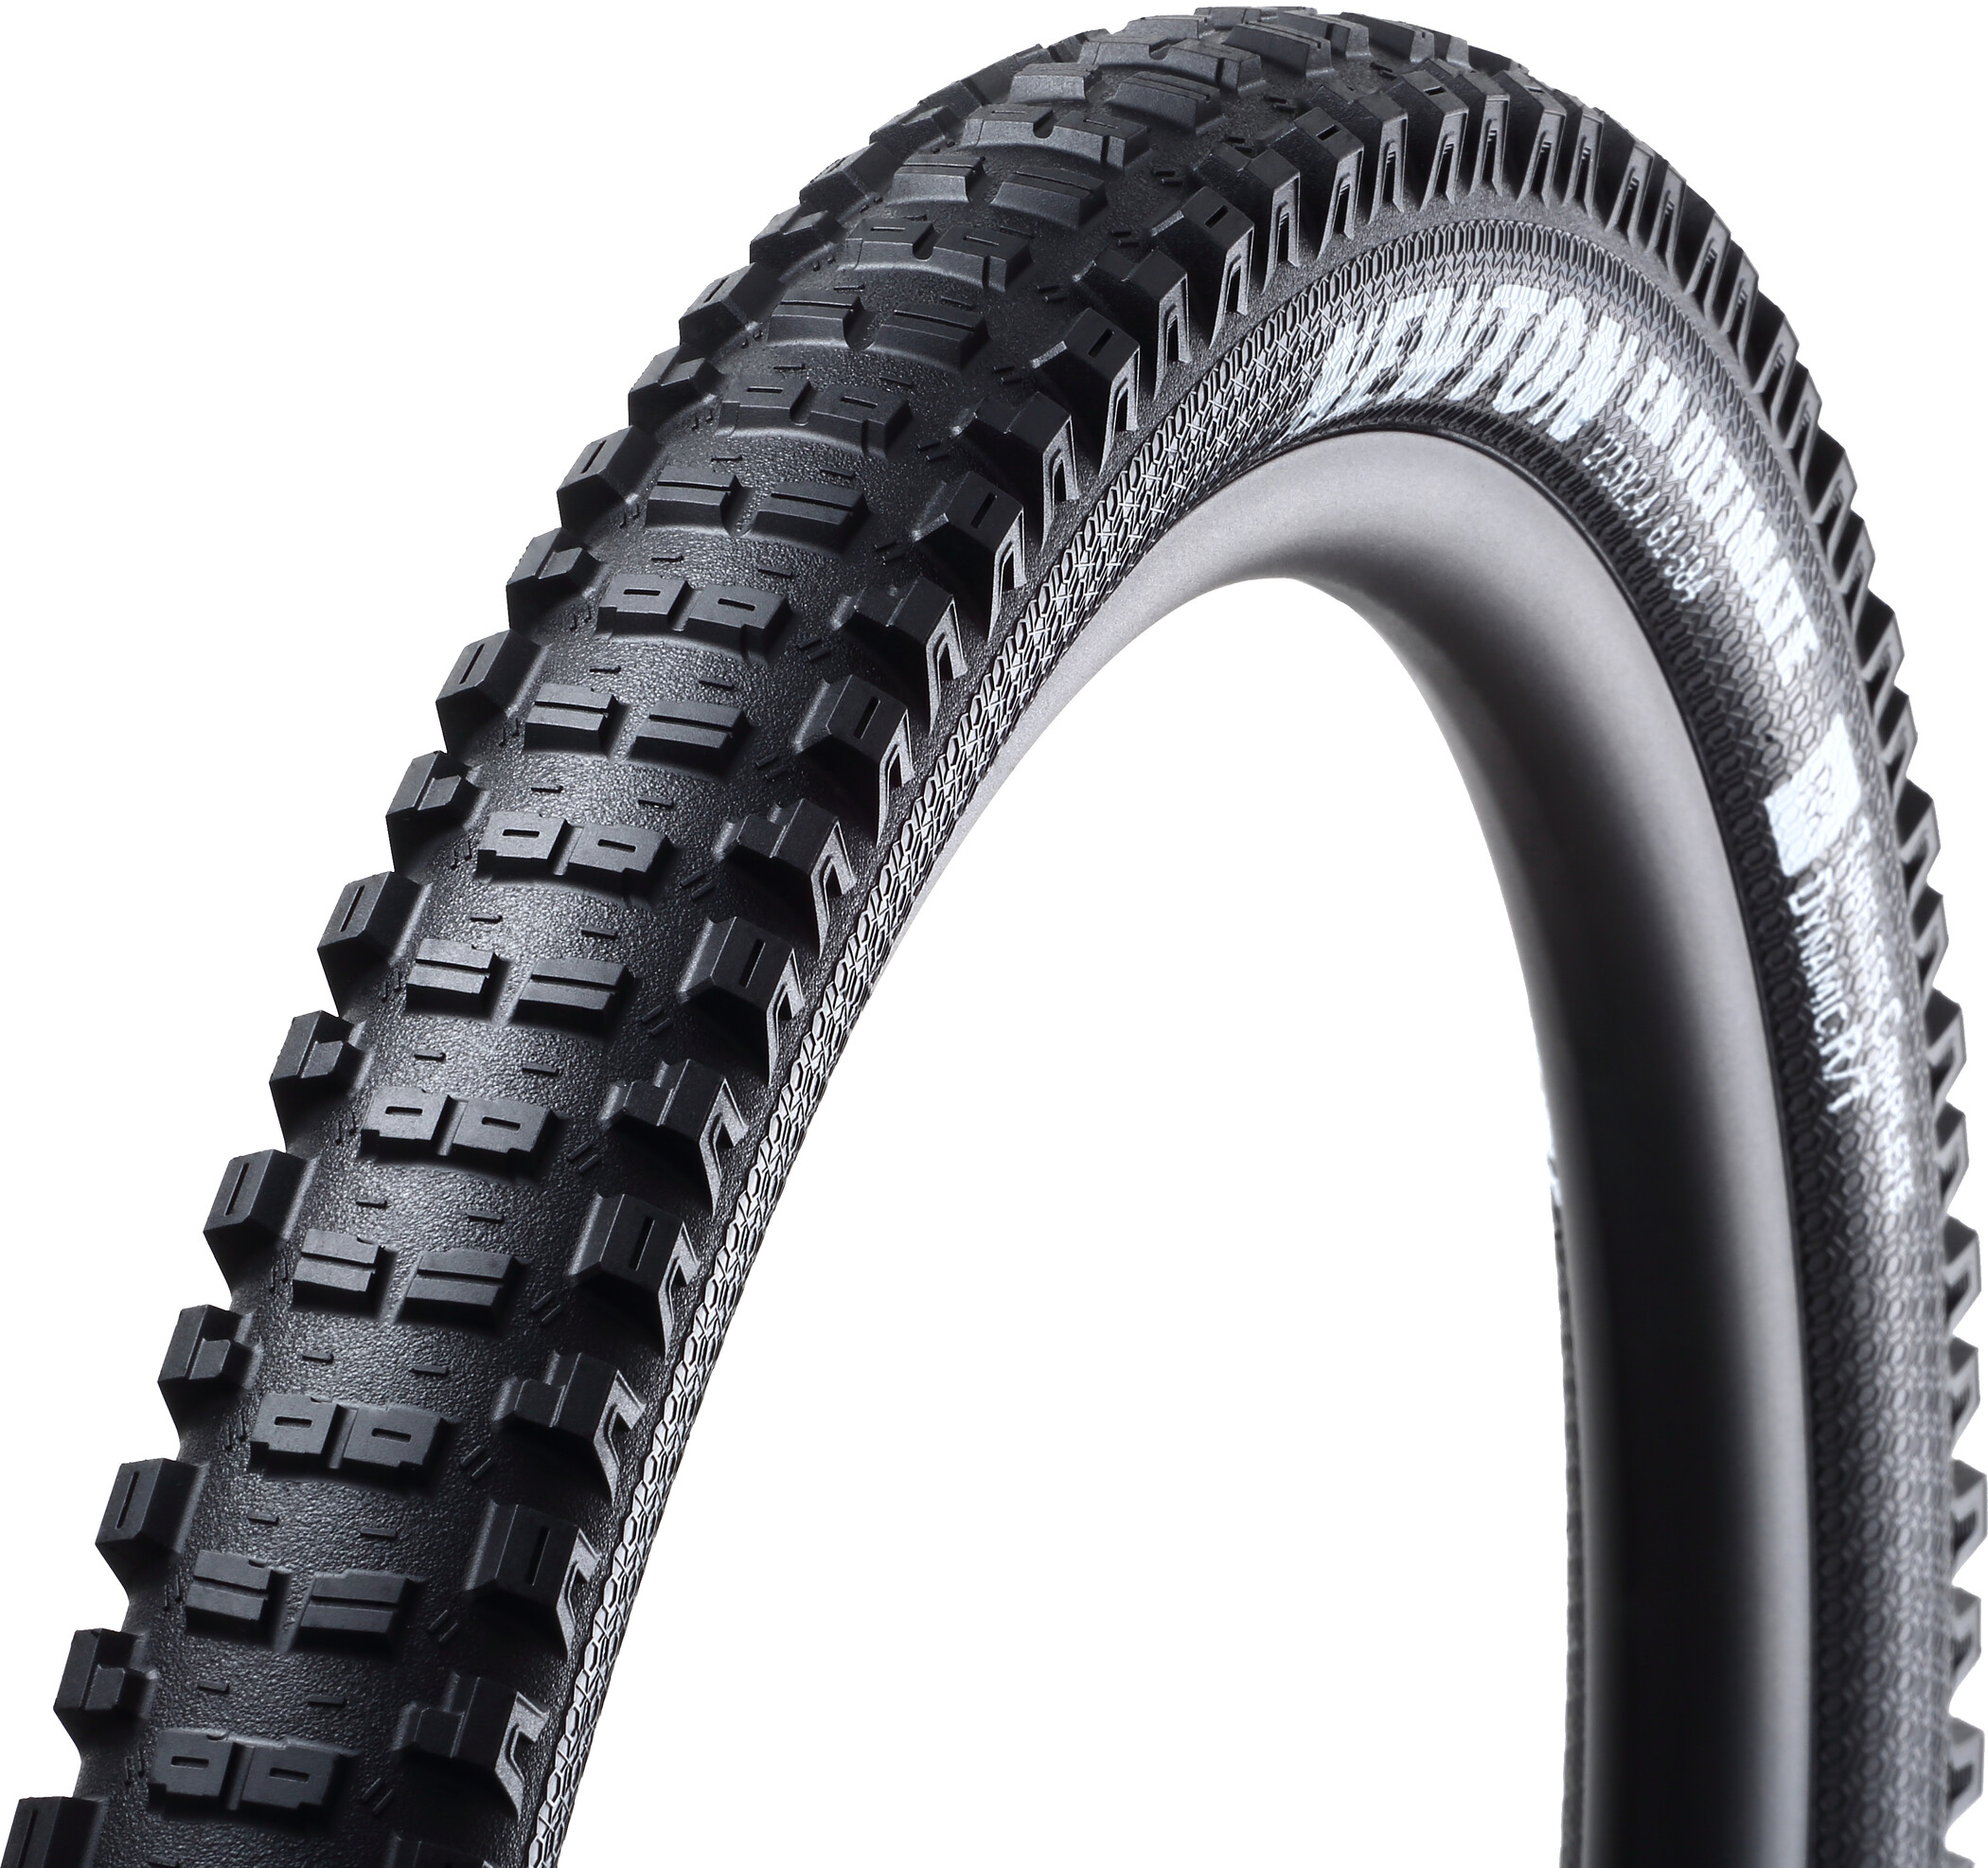 Goodyear Newton EN Premium Foldedæk 66-584 Tubeless Complete Dynamic R/T e25, black (2019)   Tyres